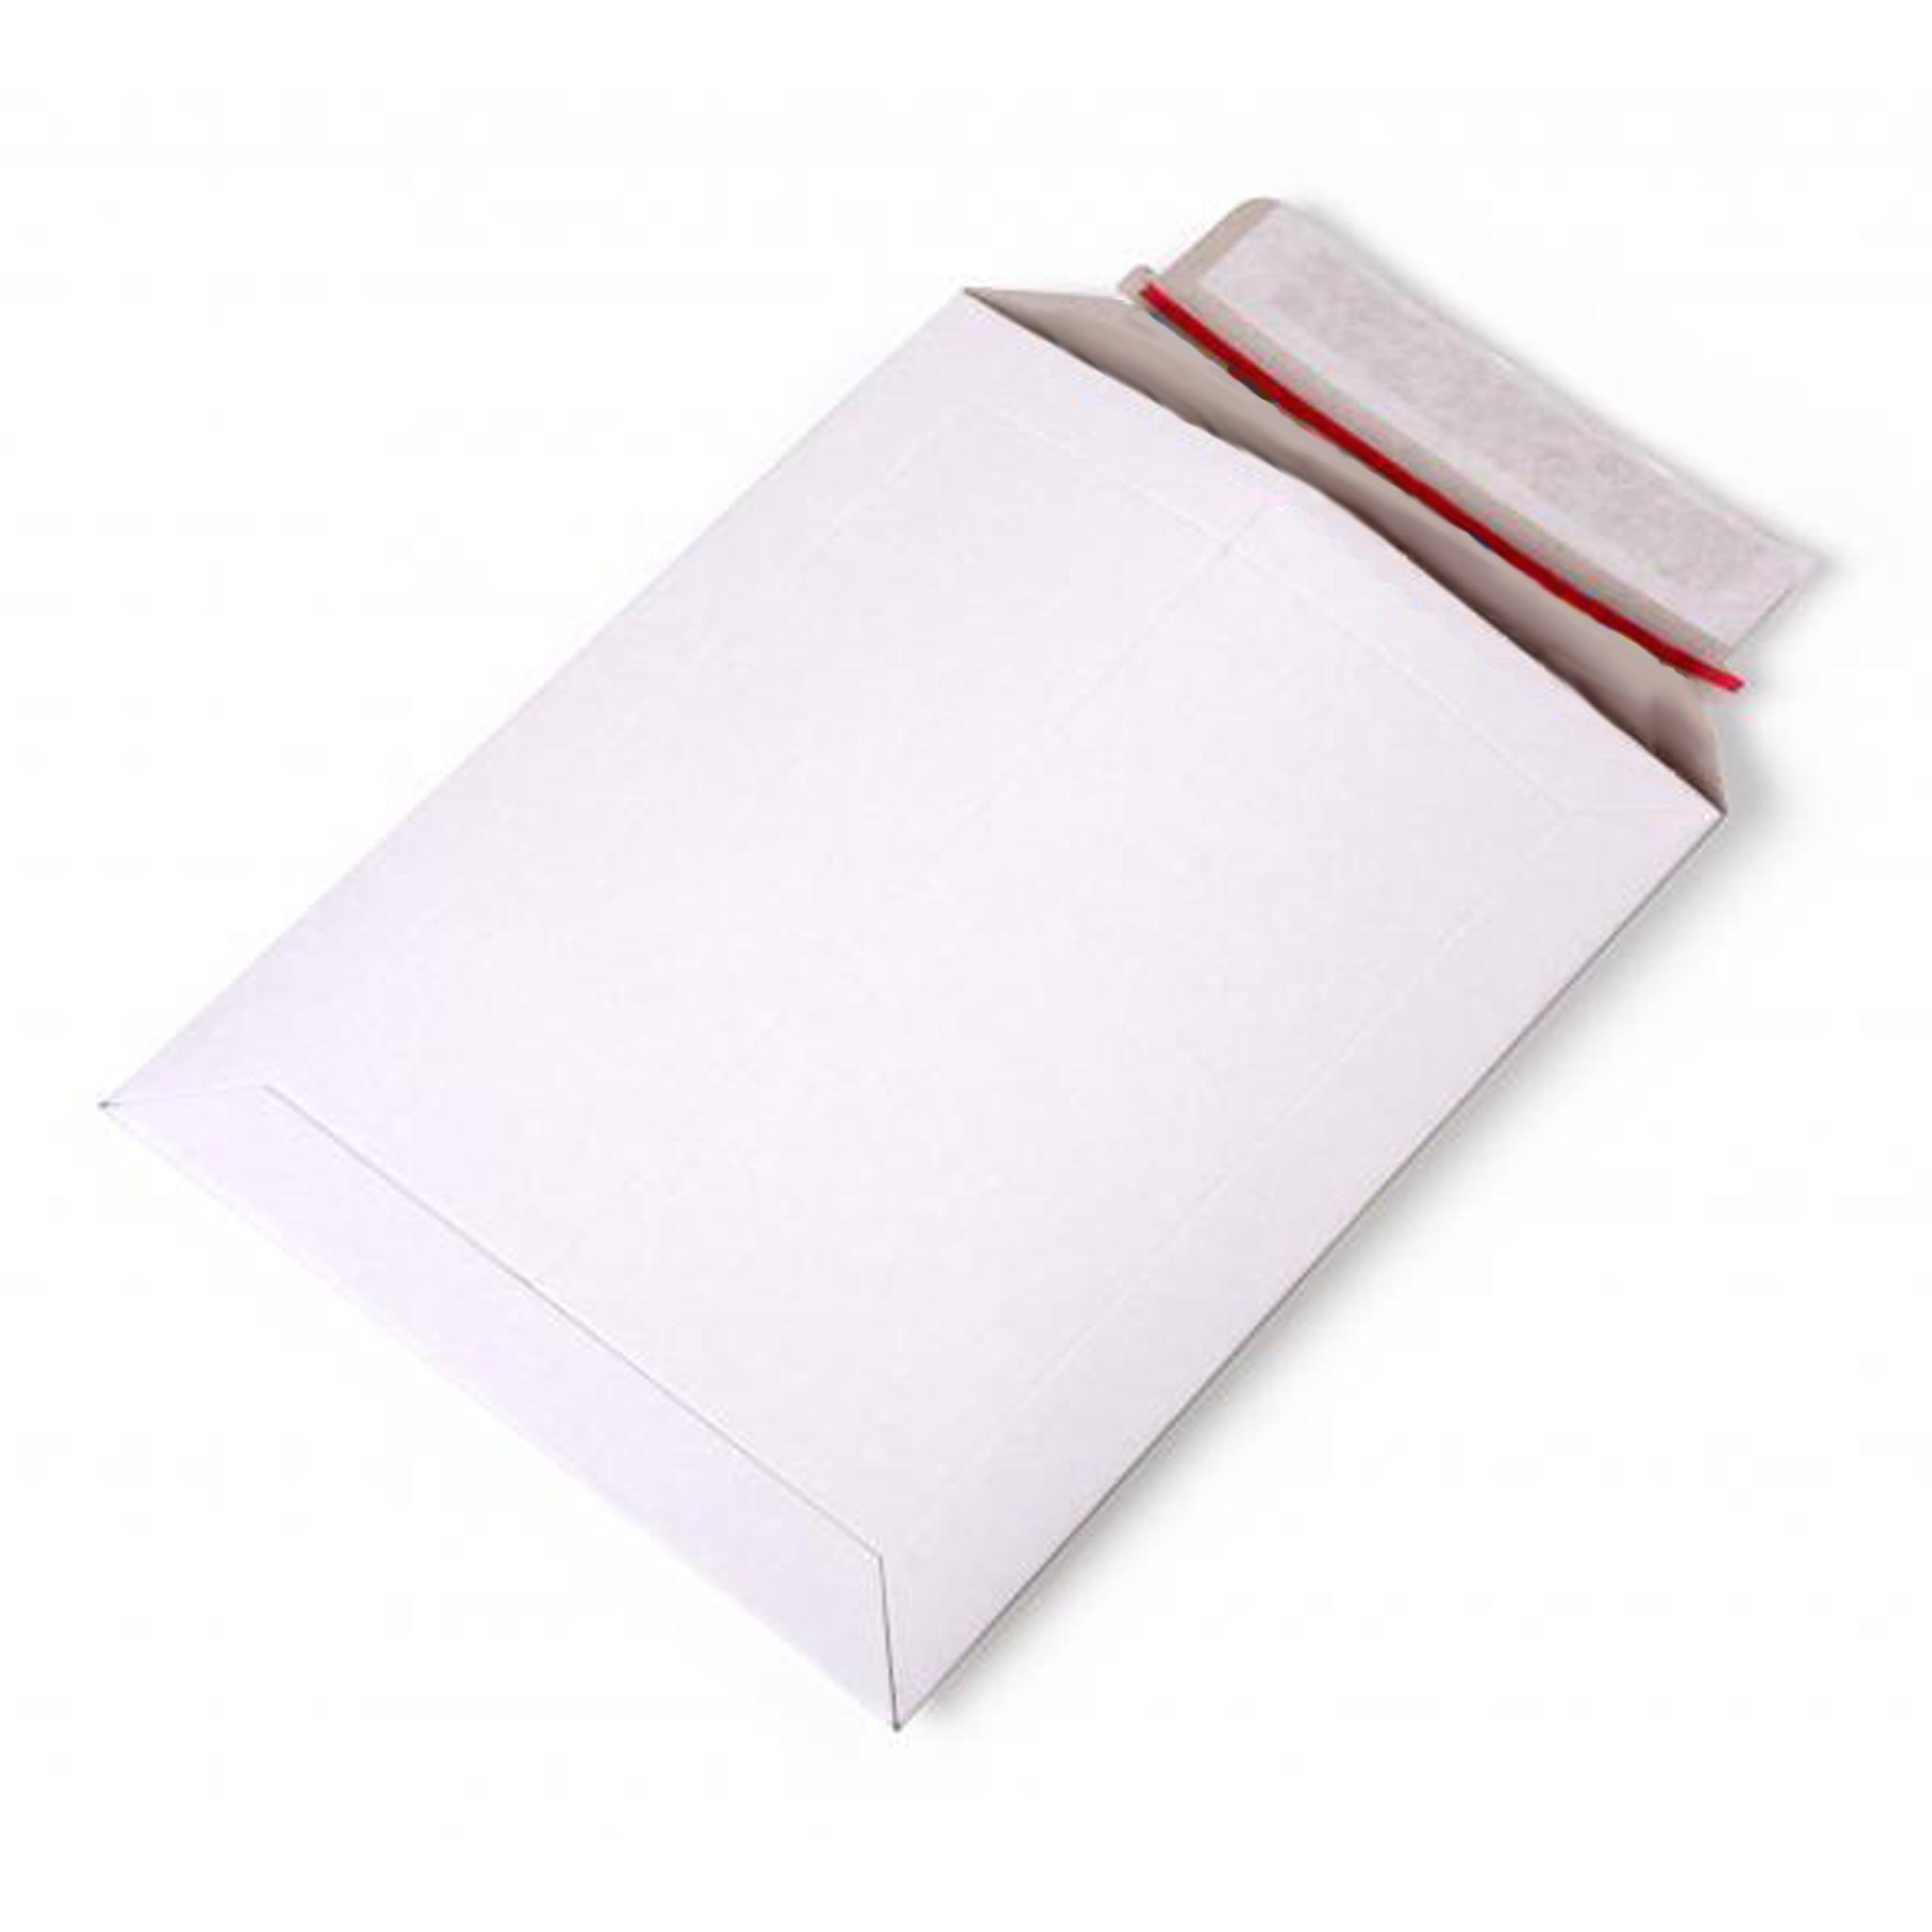 Kartonnen enveloppen 176 x 250 mm (B5) pakje van 100 stuks